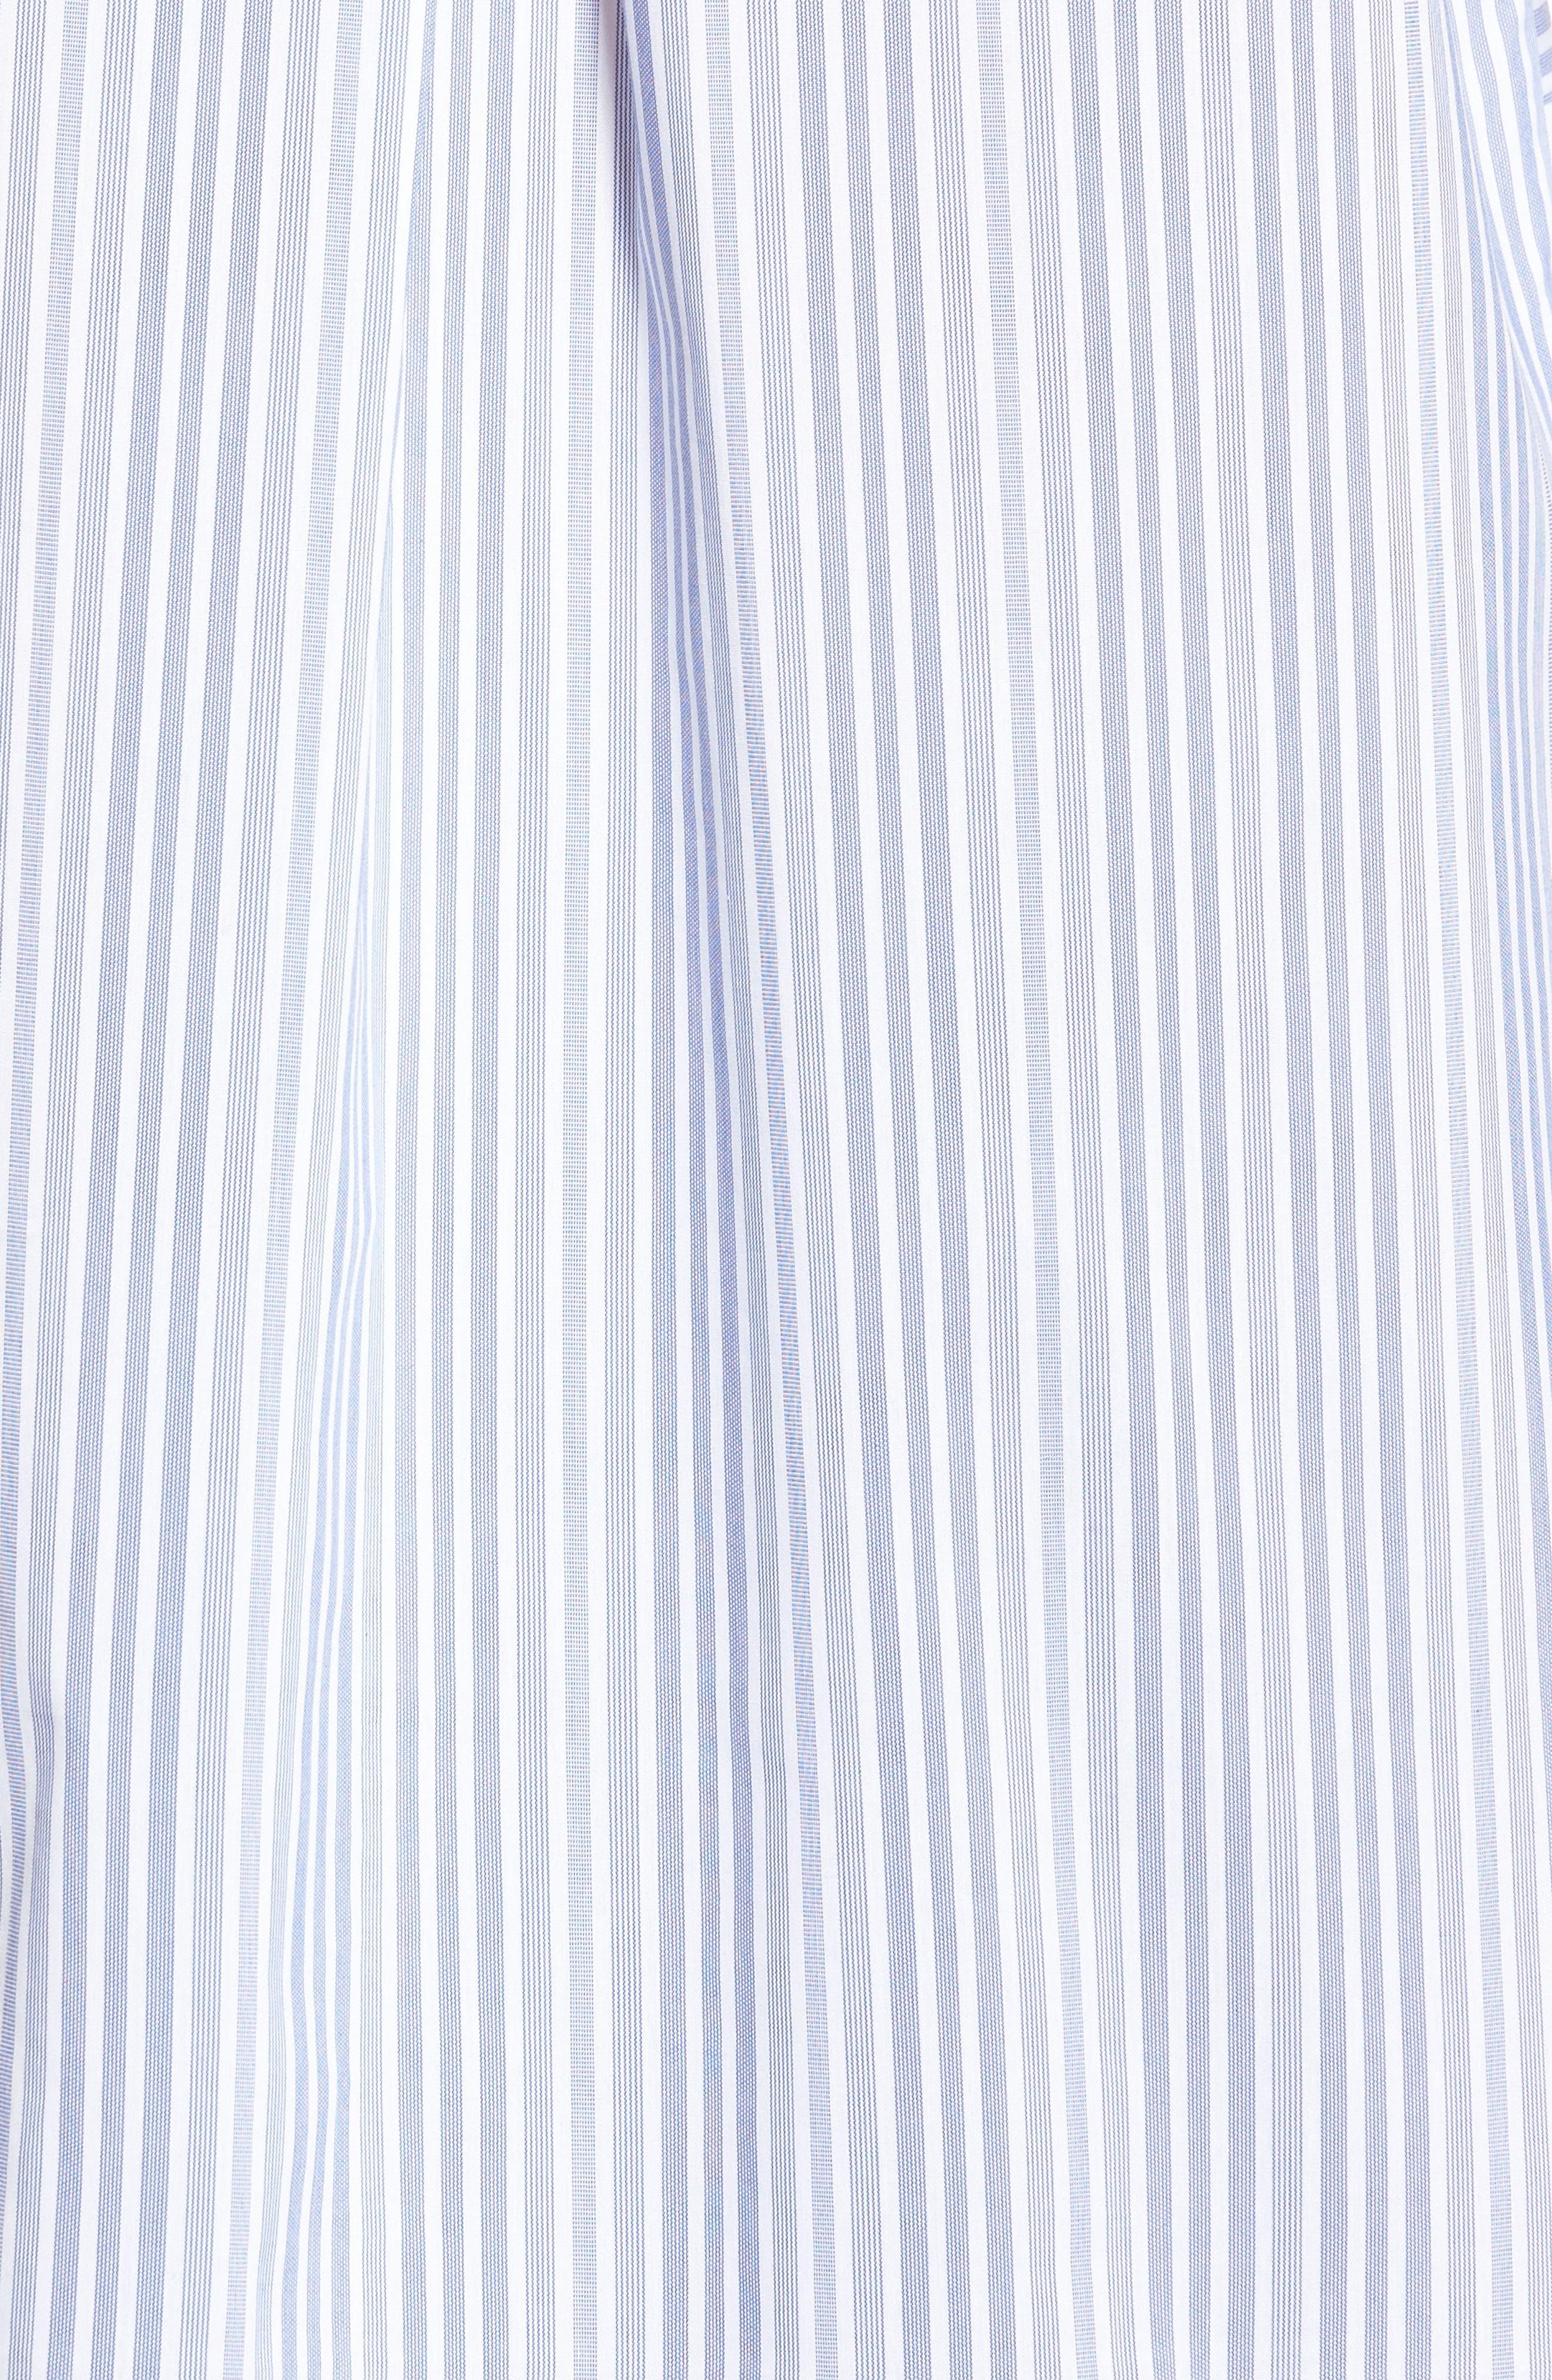 Pocket Detail Stripe Tunic Top,                             Alternate thumbnail 5, color,                             Blue- White Stripe